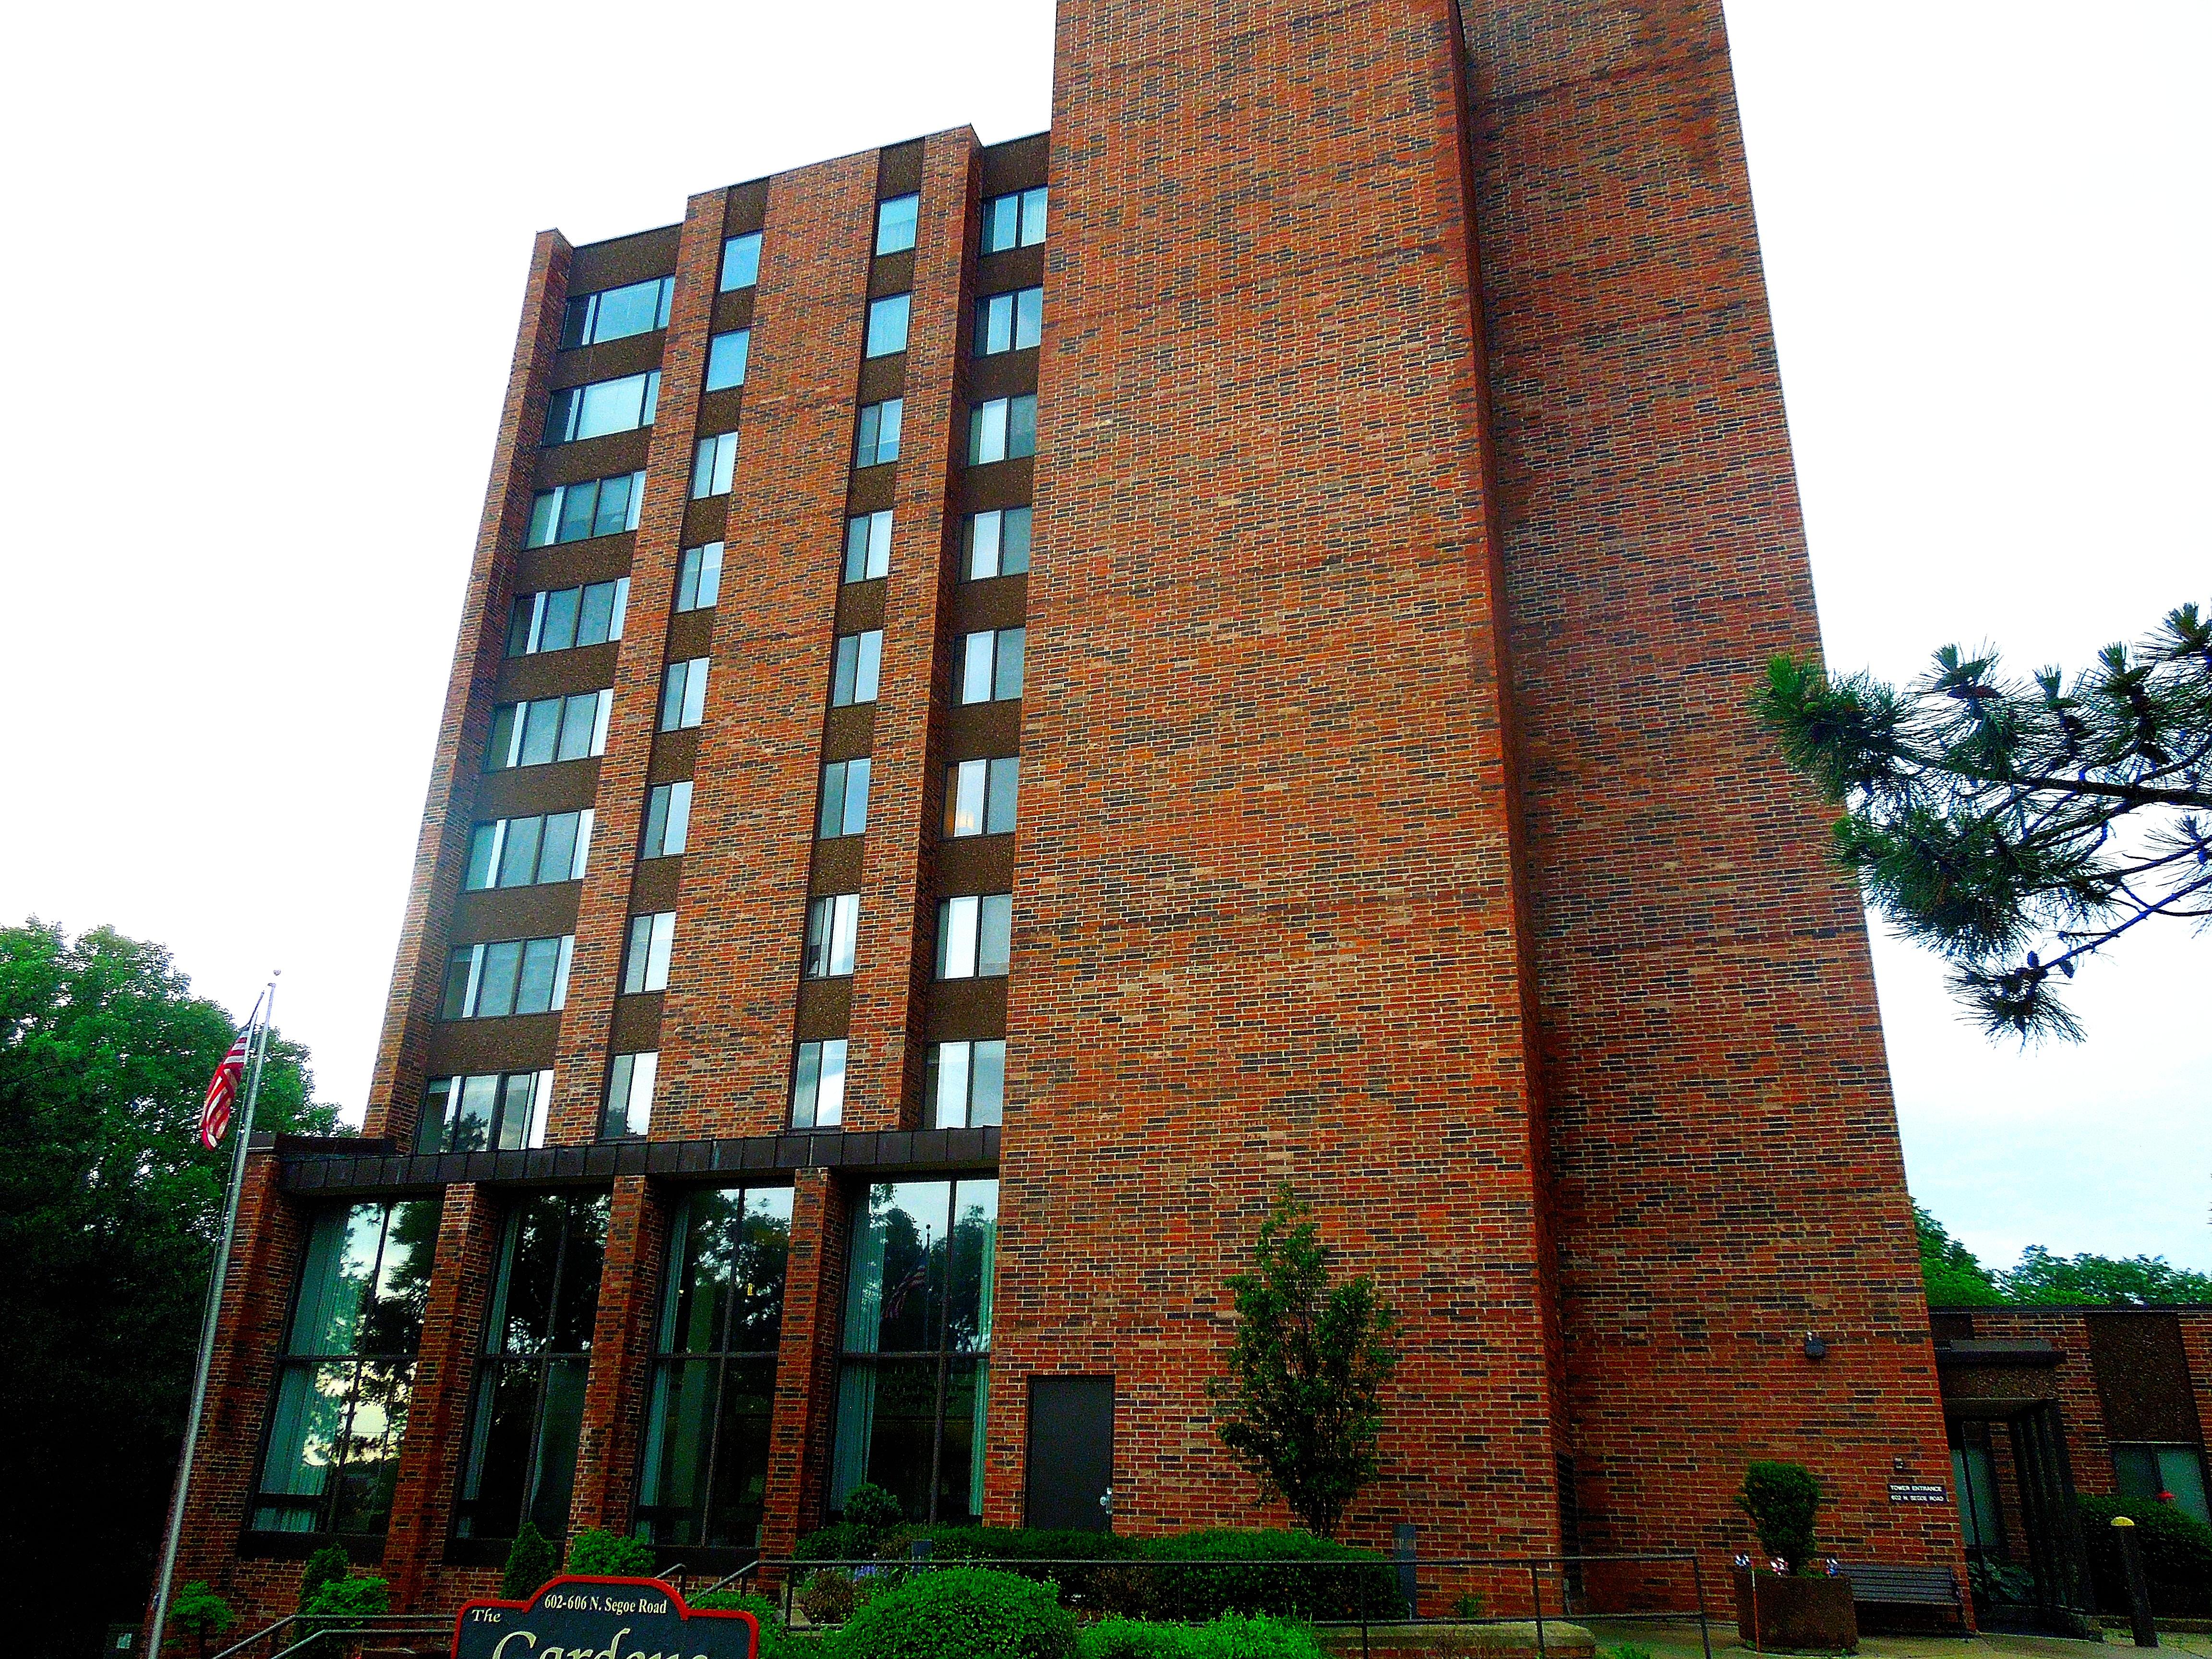 Exterior of Senior Living High Rise Building